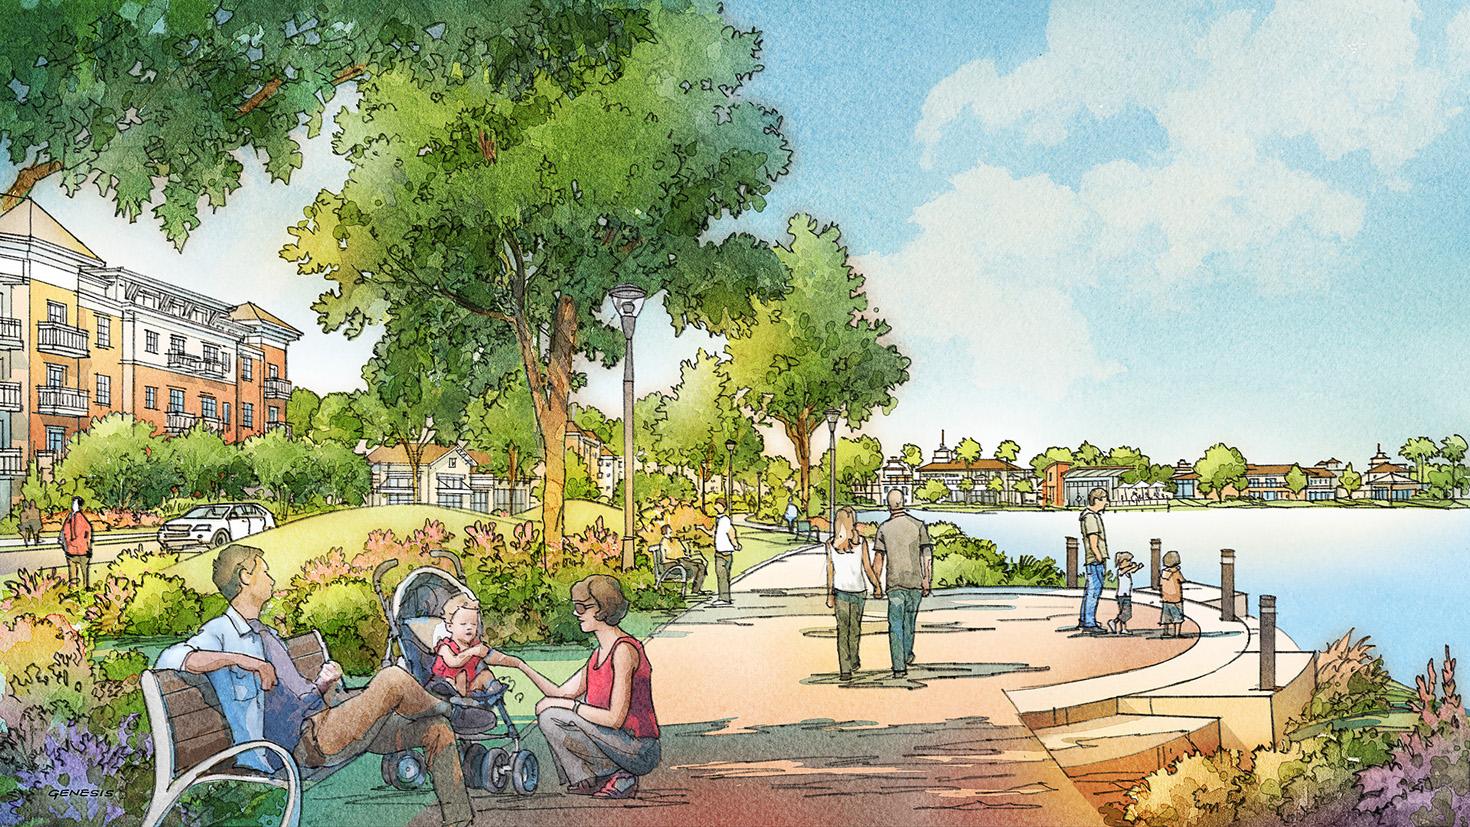 616030- Digital Watercolor Architectural Rendering of Gate Parkway Lake for CallisonRTKL